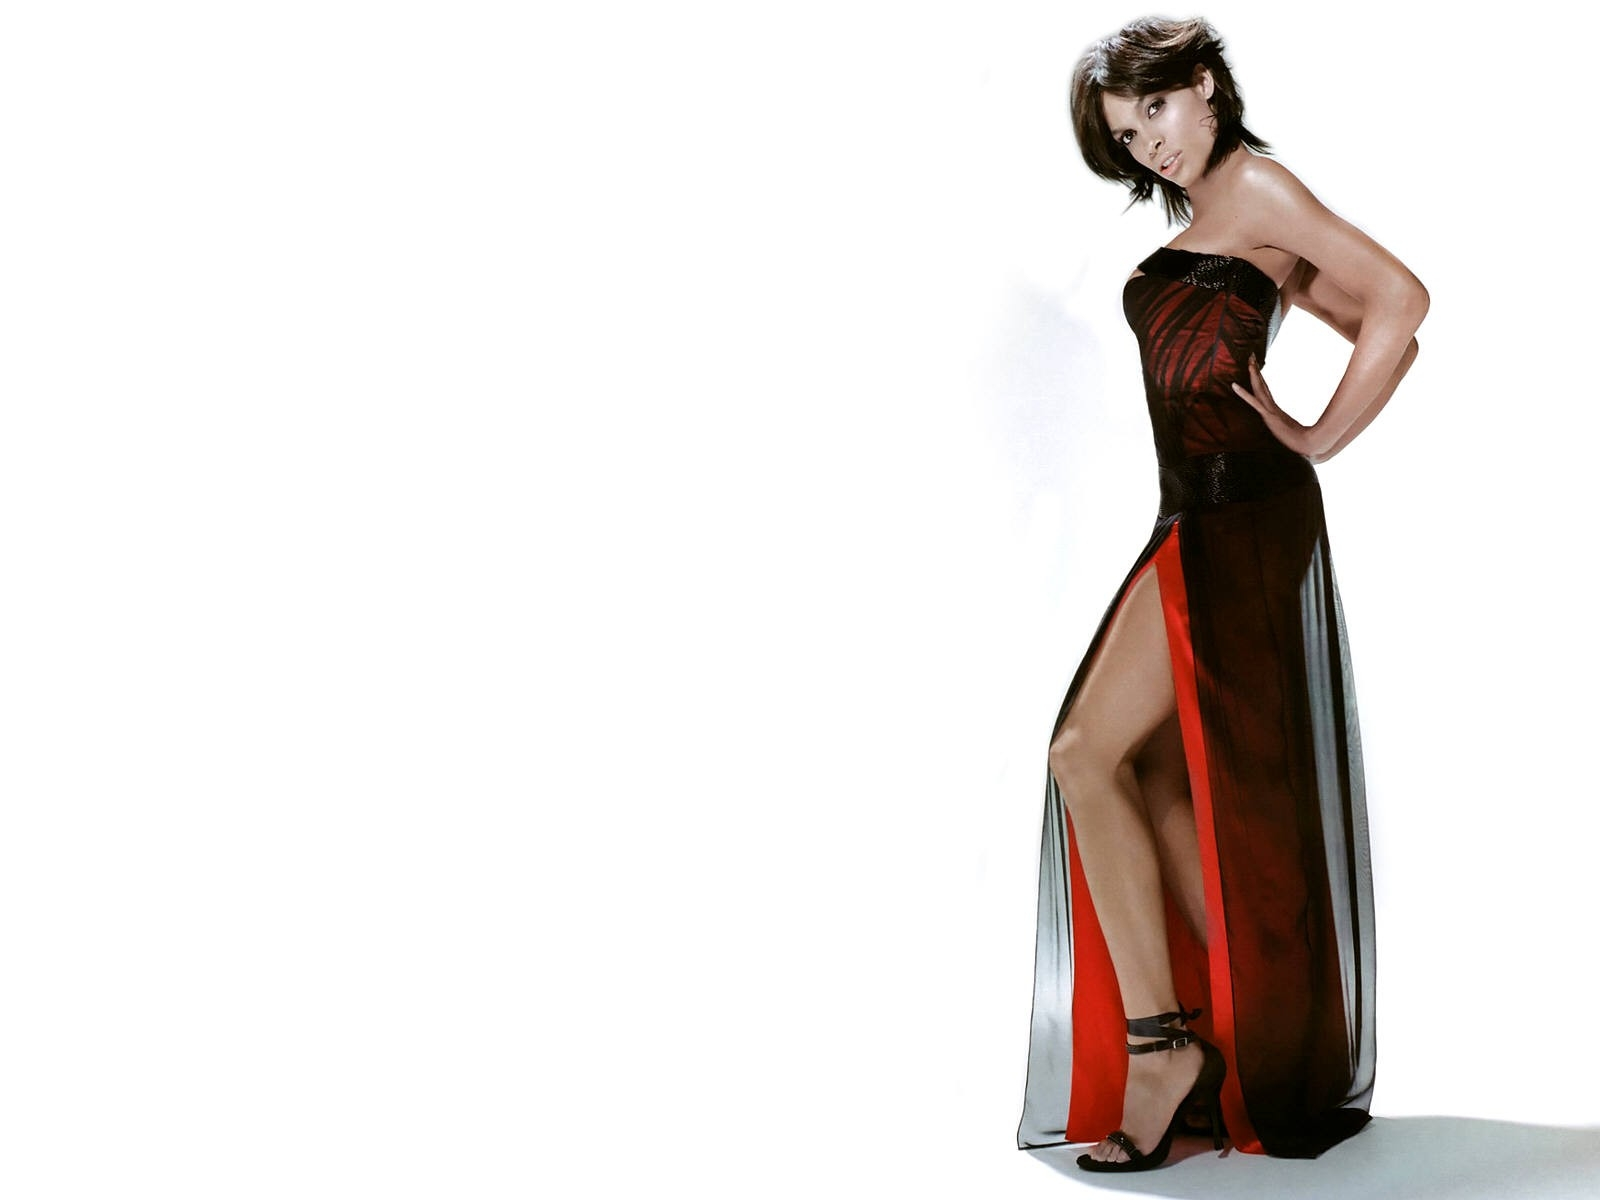 Wallpaper - una seducente Rosario Dawson